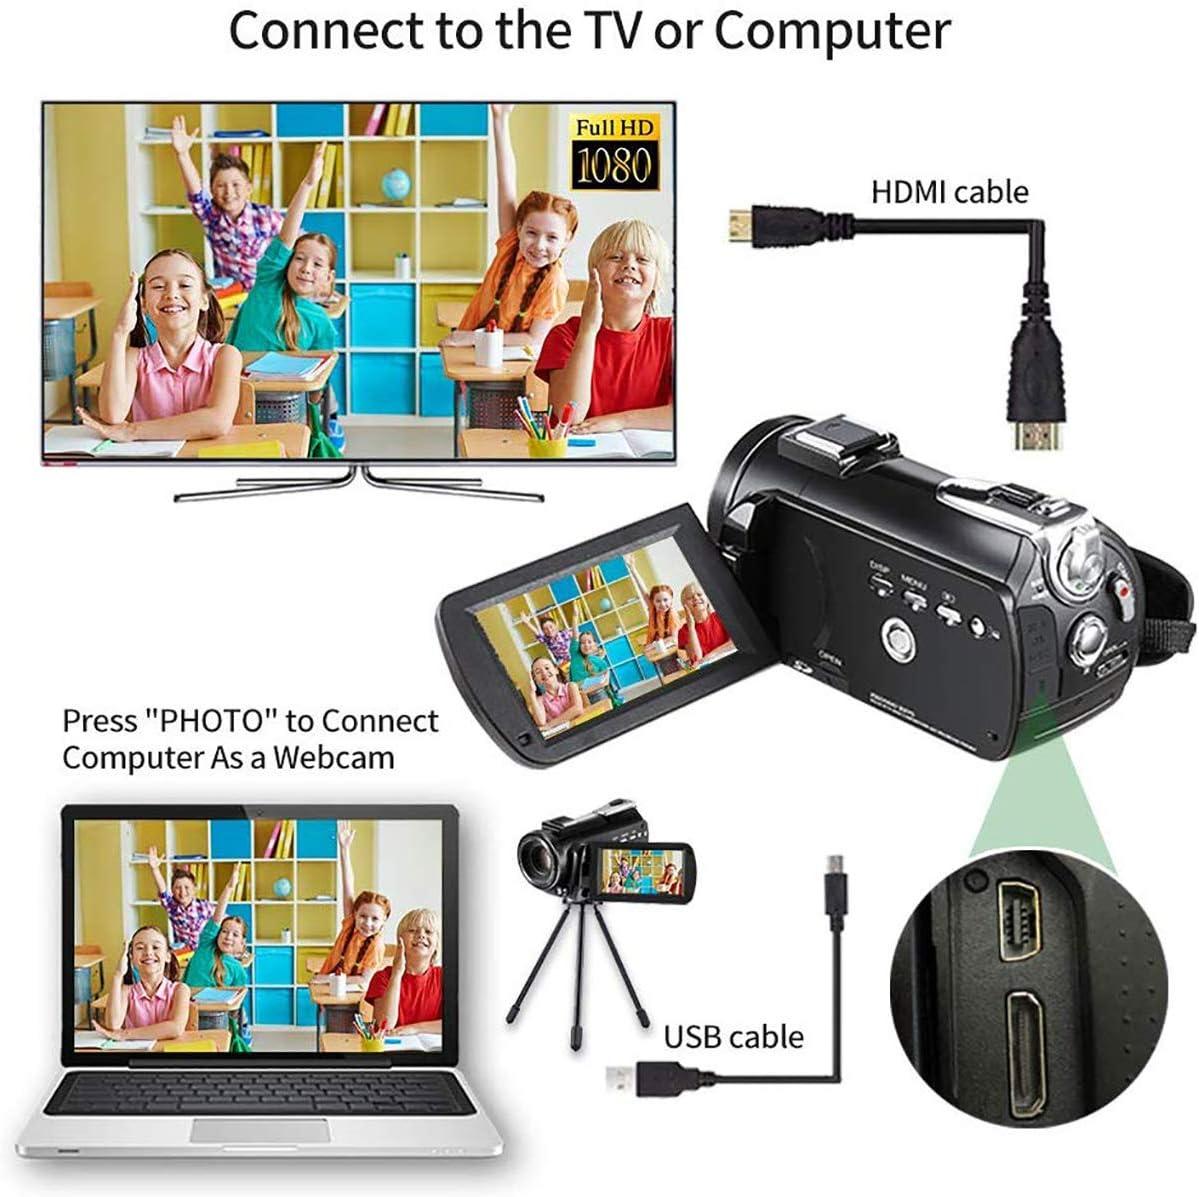 Estudiantes para Adultos//Mayores//Ni/ños ZORNIK C/ámaras Digitales Pink C/ámara Compacta 2.88 Pulgadas LCD Recargable HD 44 Megap/íxeles Zoom Digital 16x